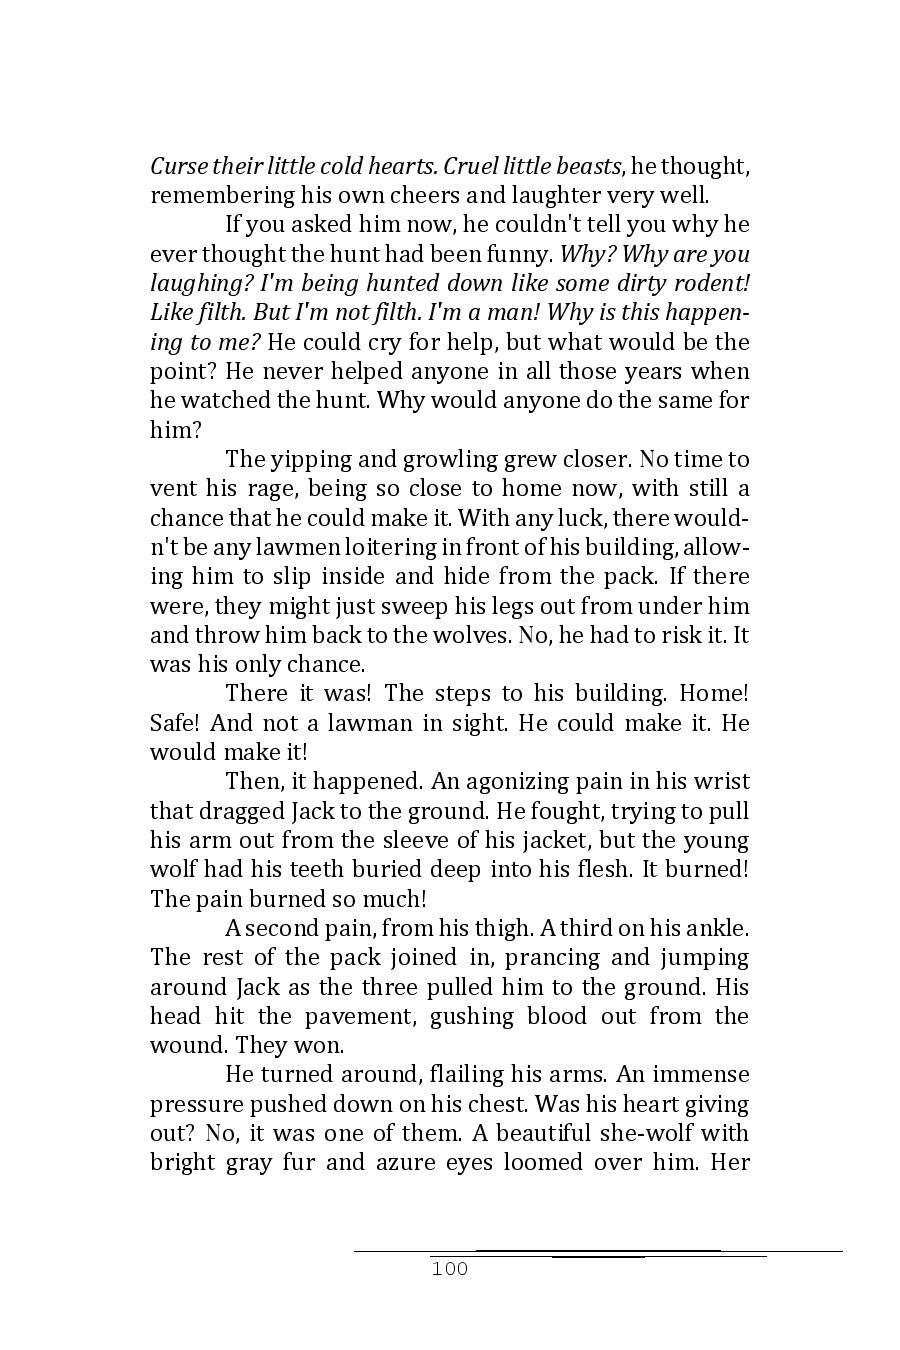 Hinnom Magazine 003 Manuscript Print-page-104